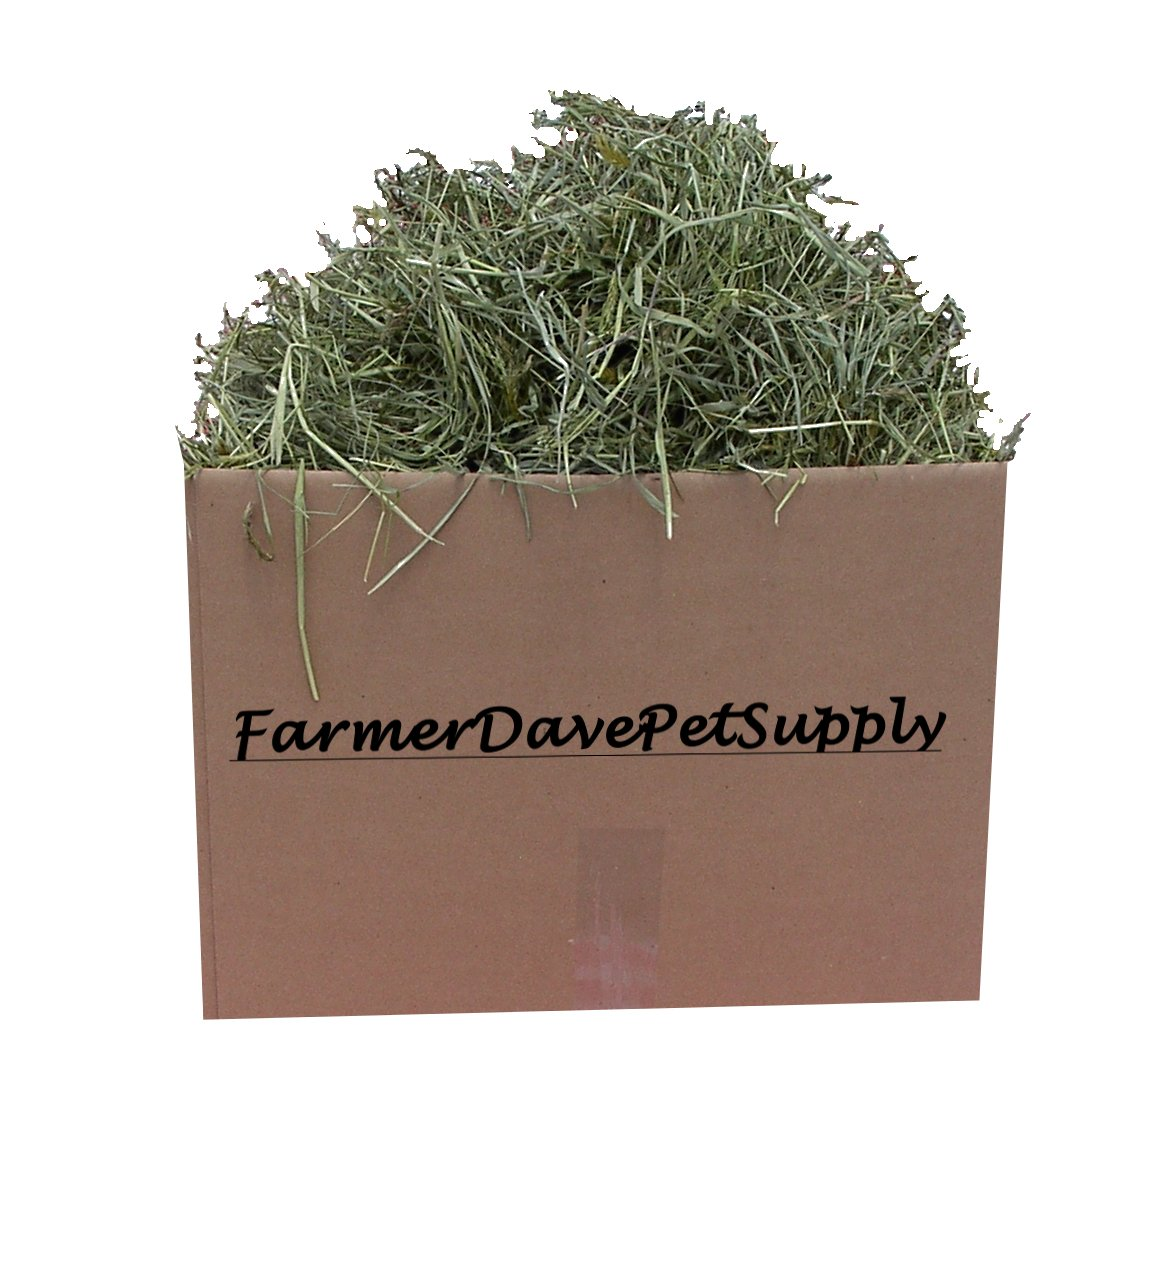 FarmerDavePetSupply 10 Lb Spring Medley Hay, Rabbit and Bunny Hay